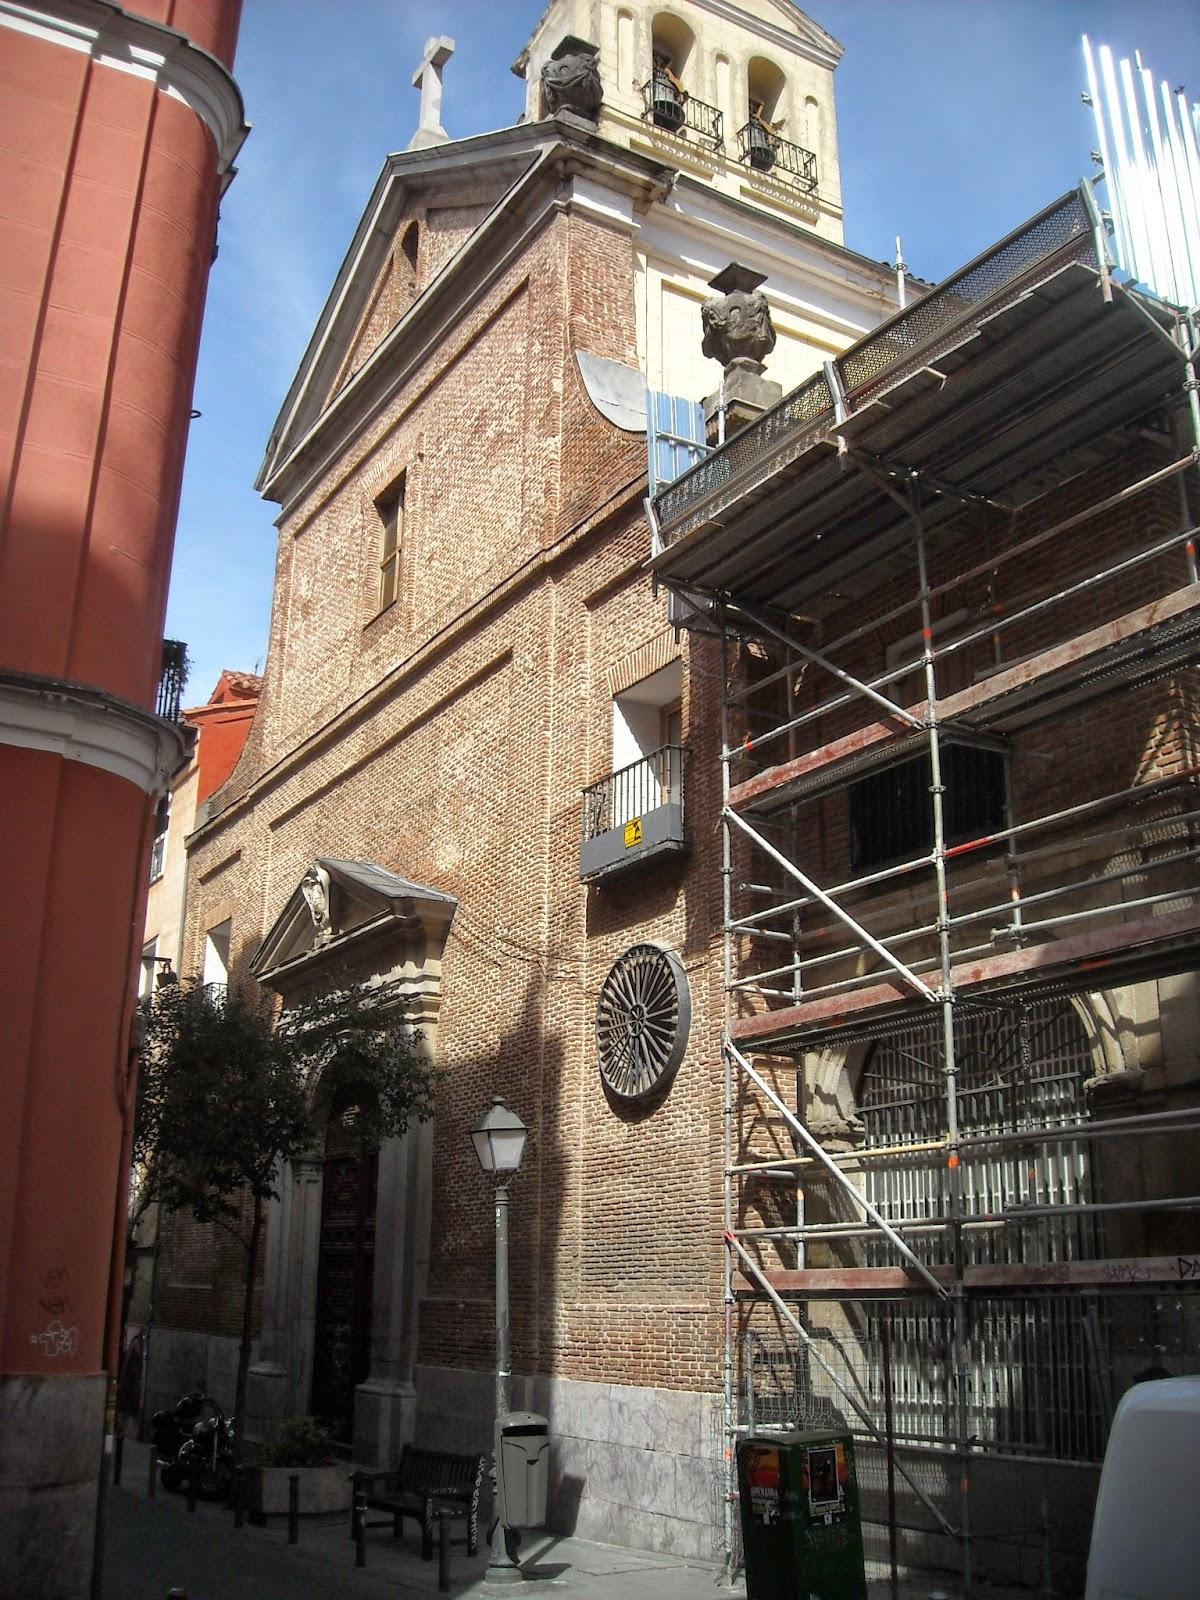 Palmapapel calle la palma 34 91 531 06 53 el madrid - Artesanos de madrid ...